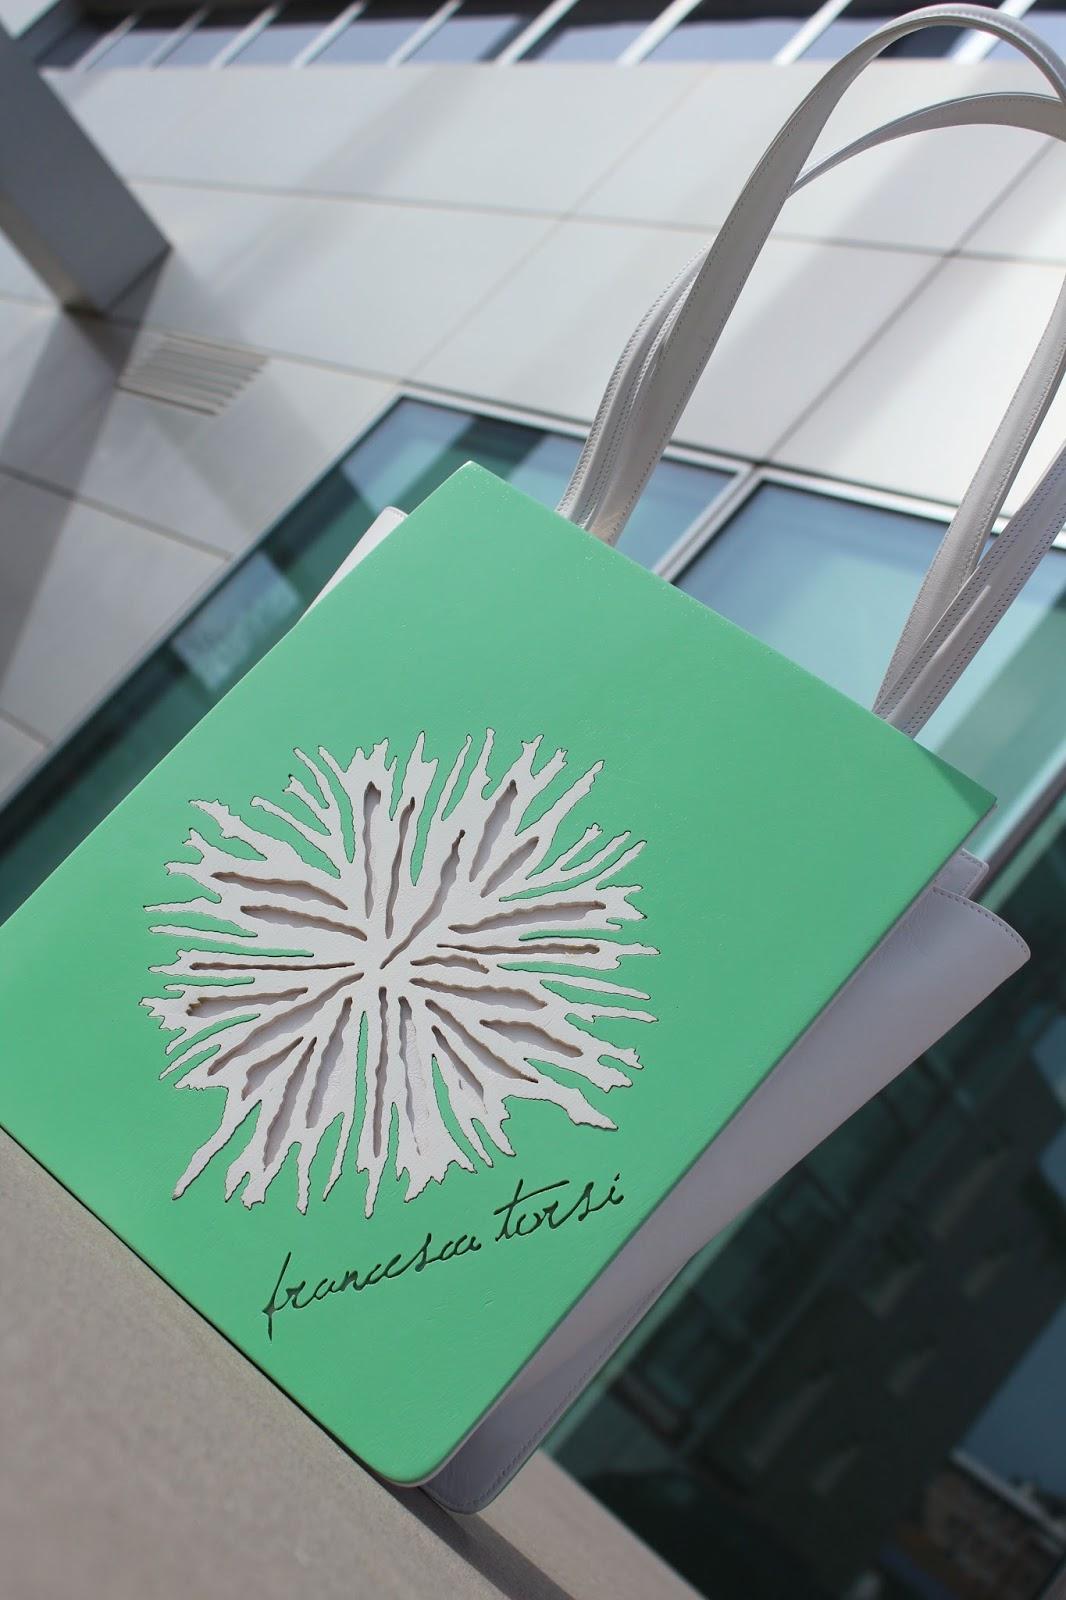 Eniwhere Fashion - Francesca Torsi